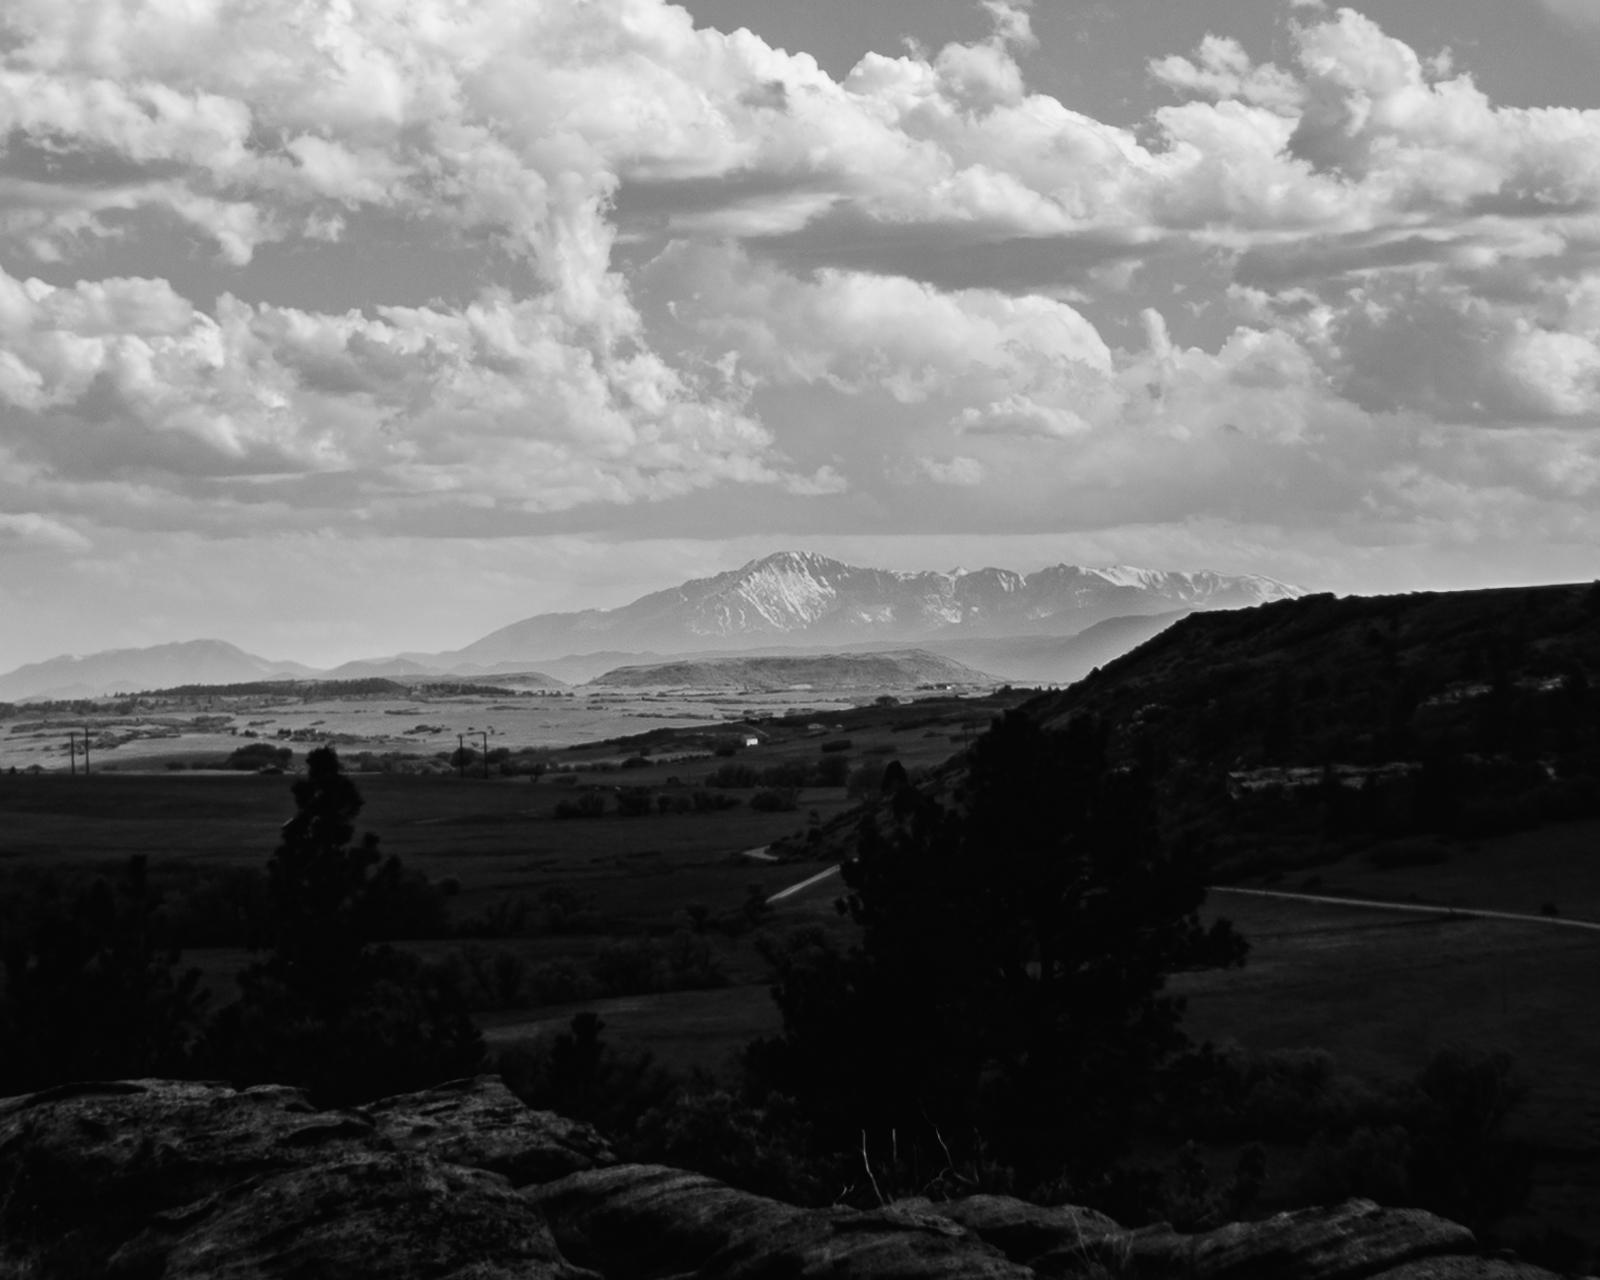 Day 161- 365 Day B&W Photo Challenge - Views of Pikes Peak through Castlewood Canyon. - Google Pixel 3, Moment Tele Lens, VSCO Fujifilm Neopan 400 Simulation